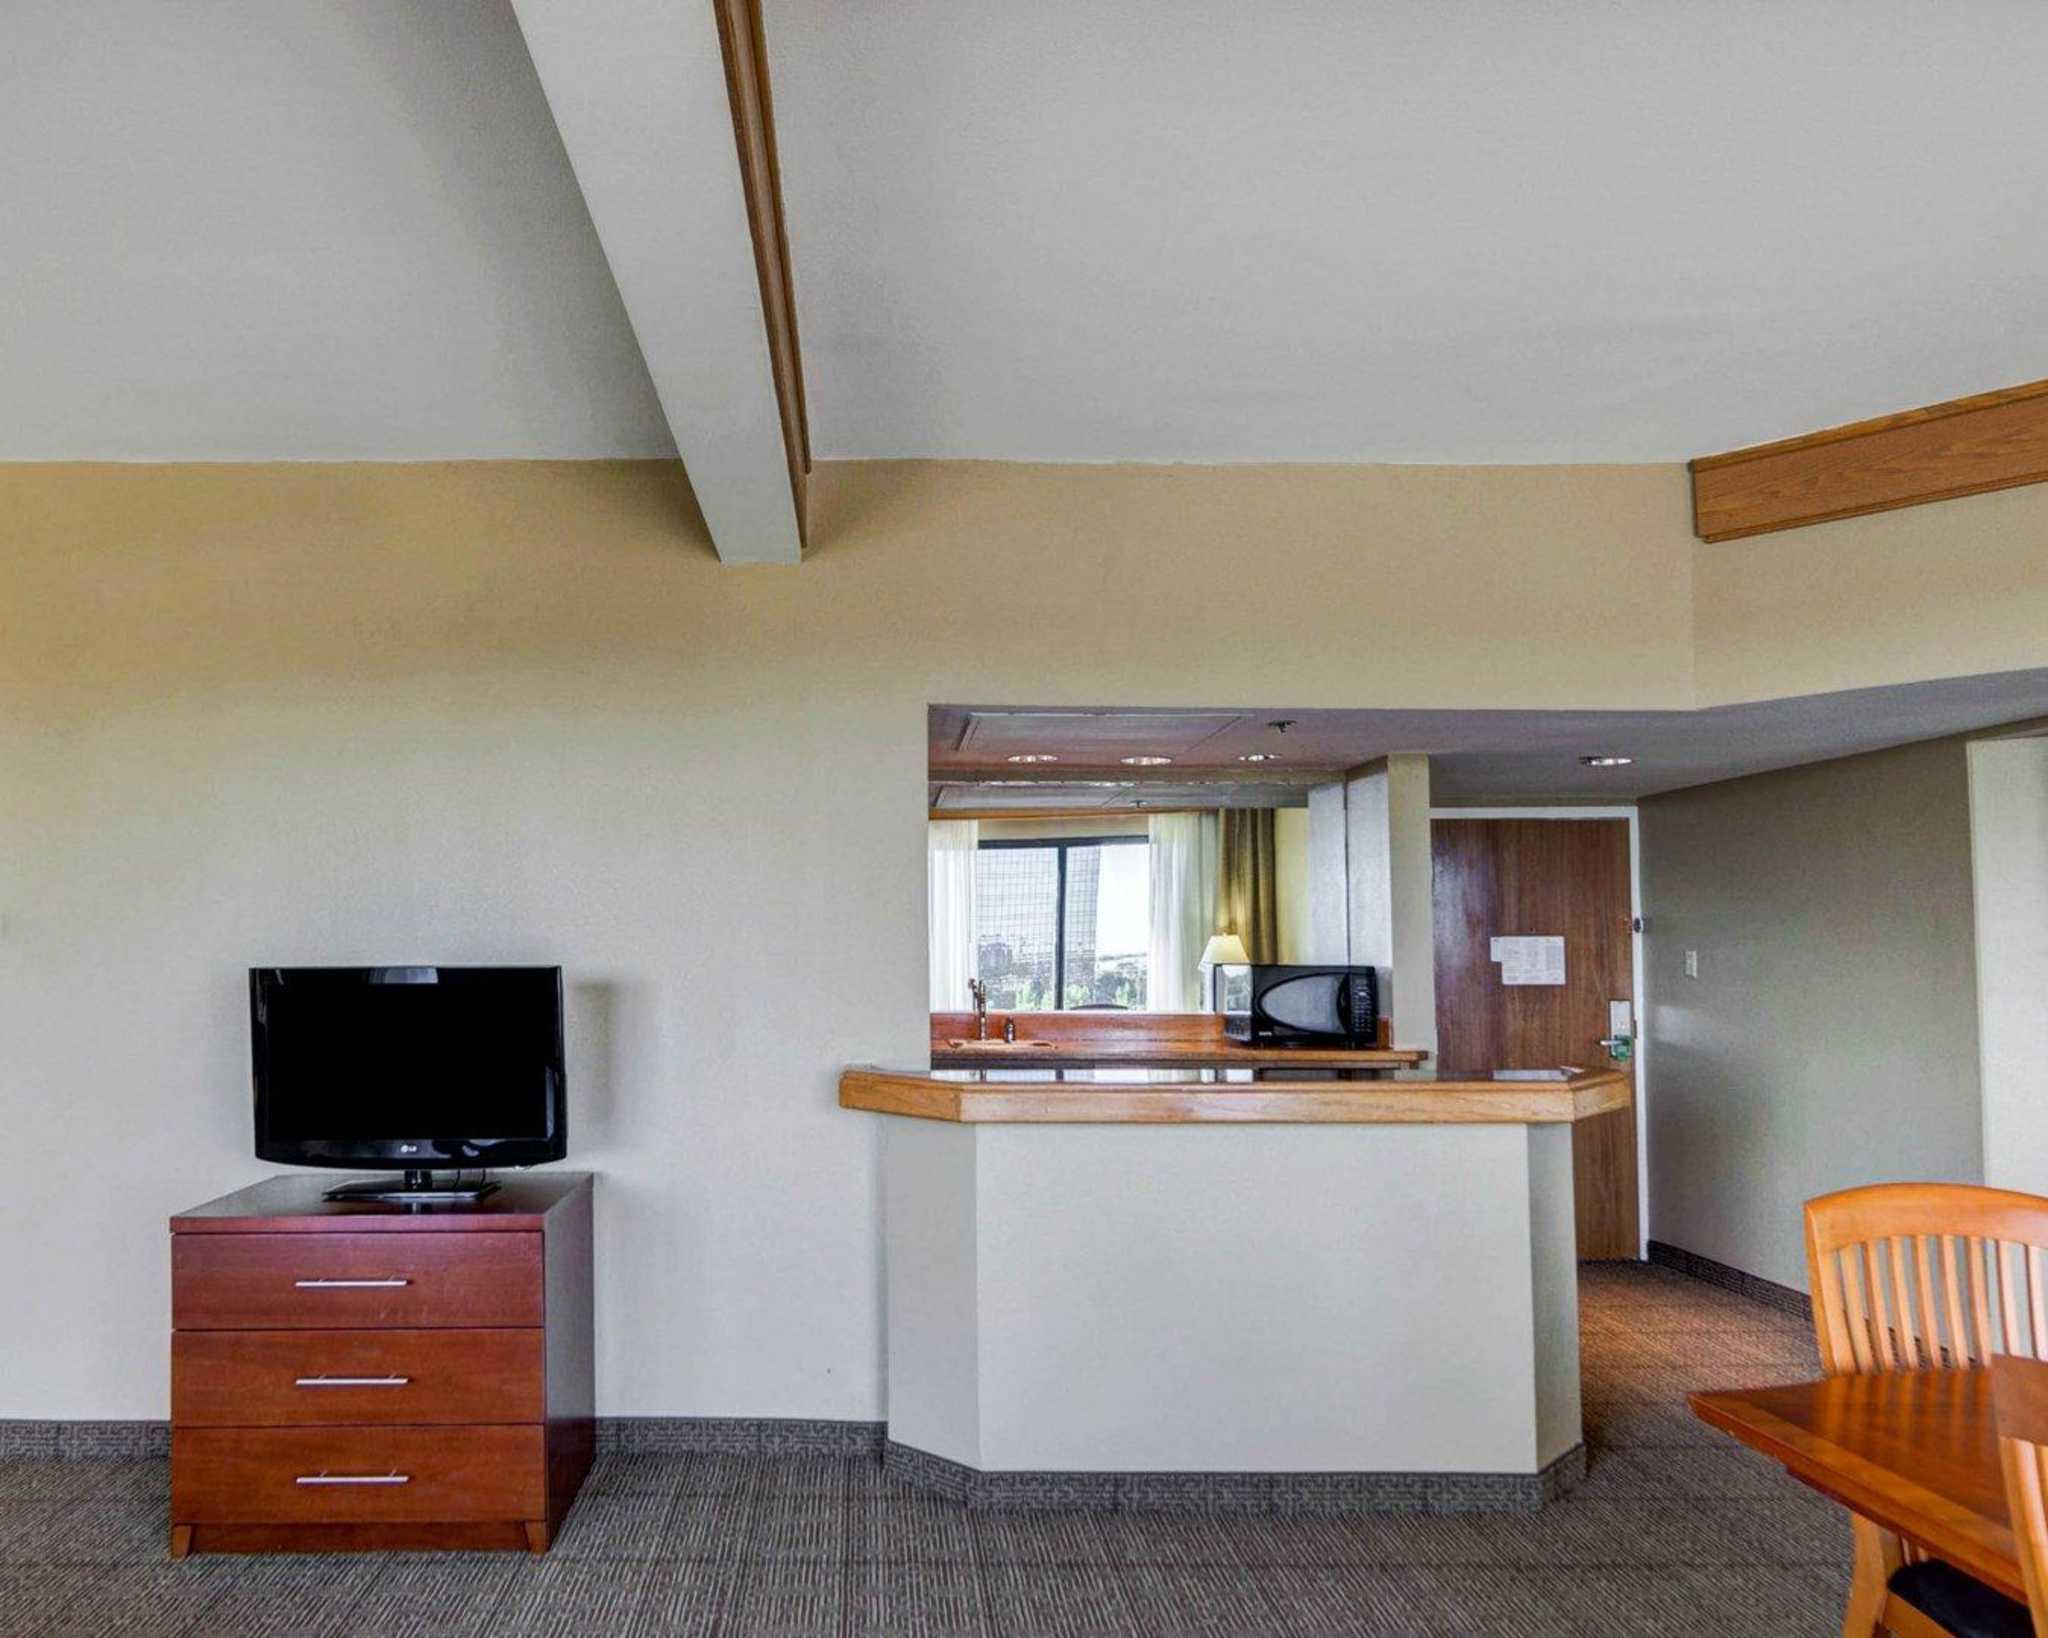 Comfort Inn & Suites Plano East image 51